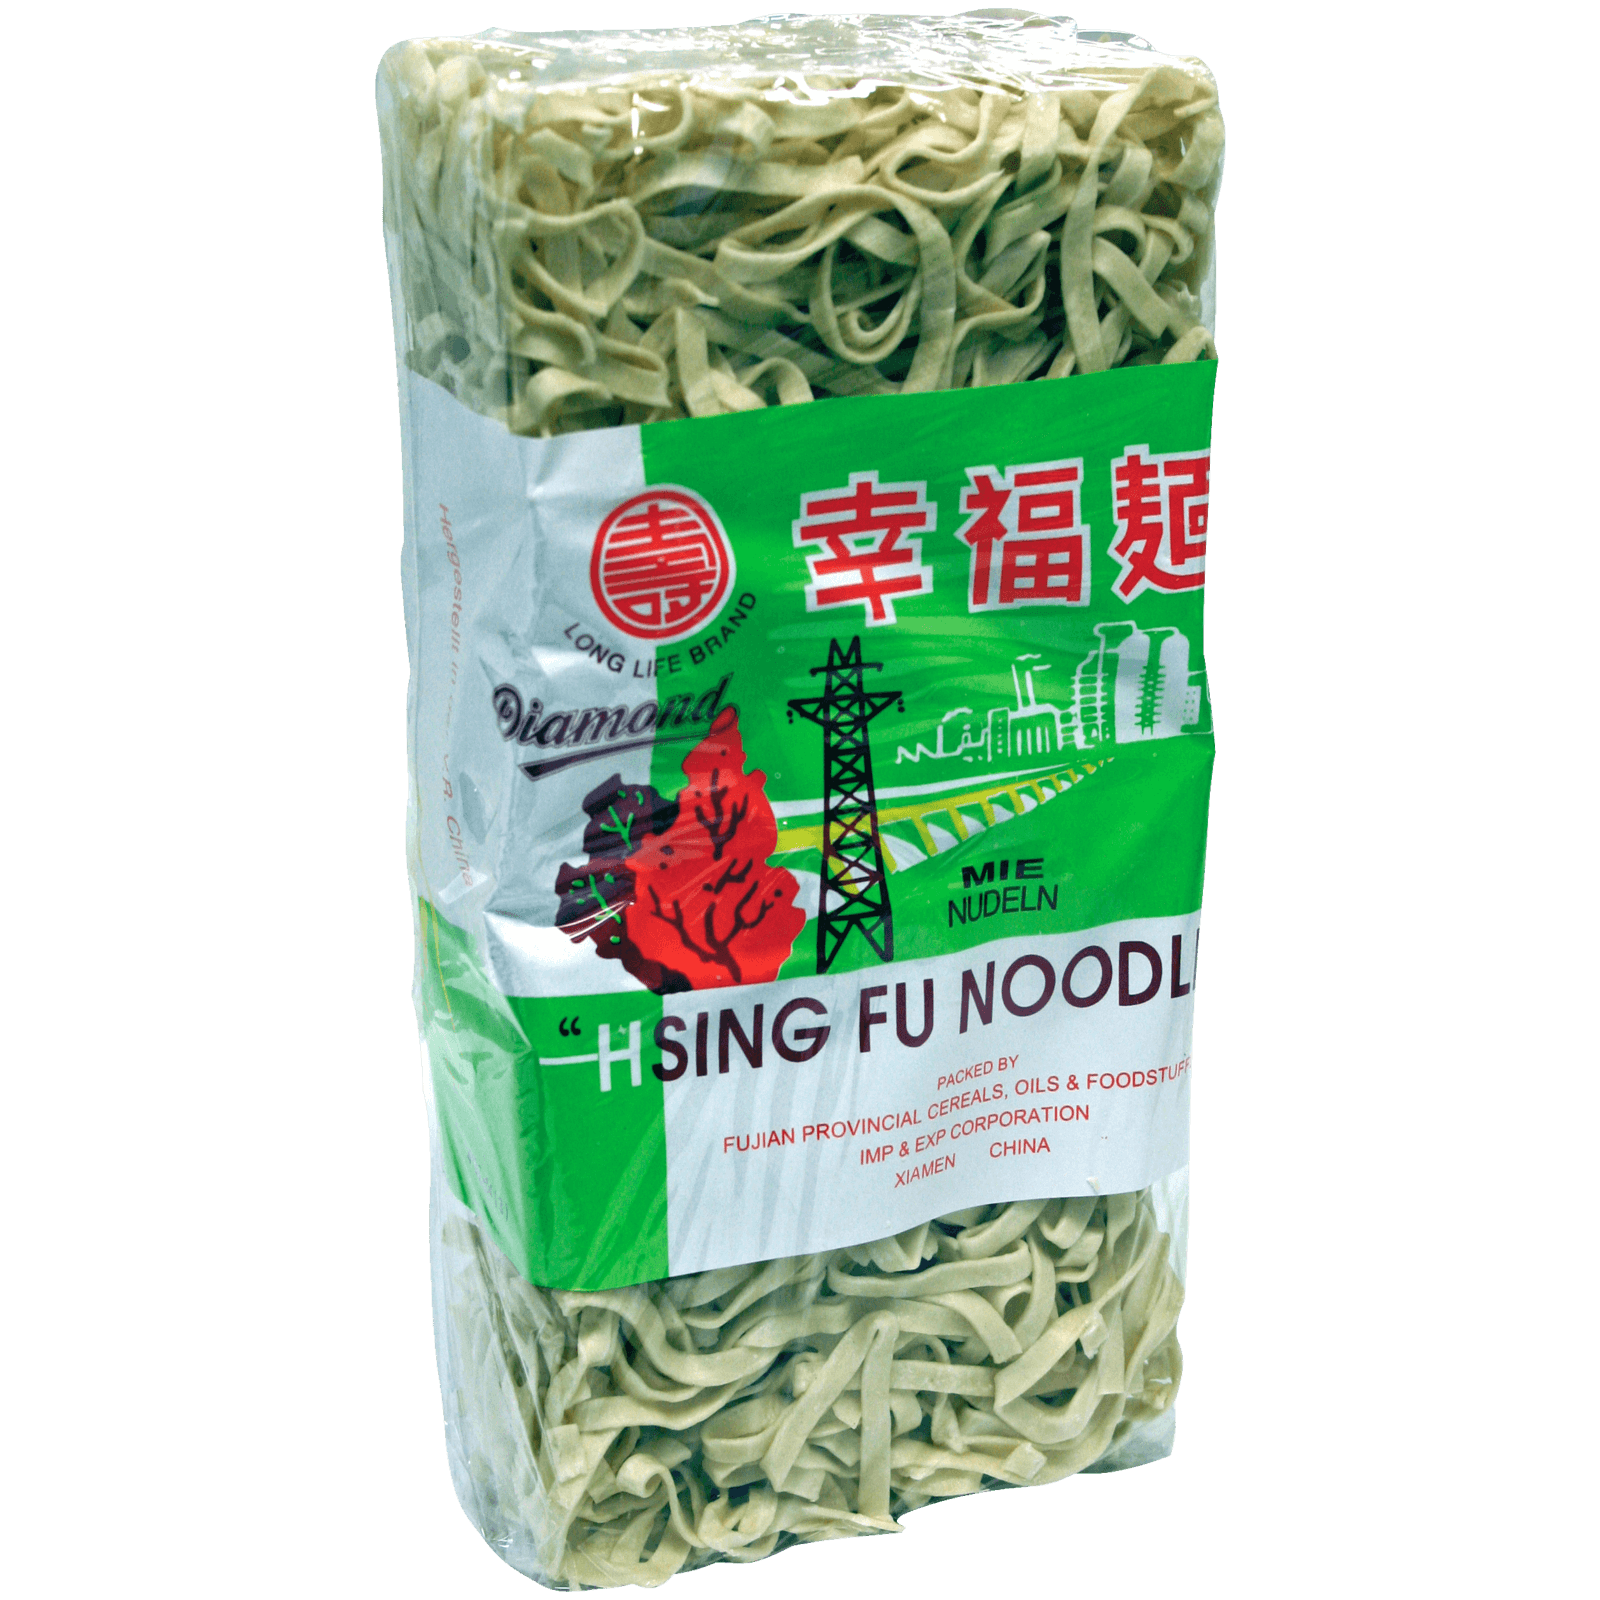 Diamond Hsing-Fu Nudeln 250g